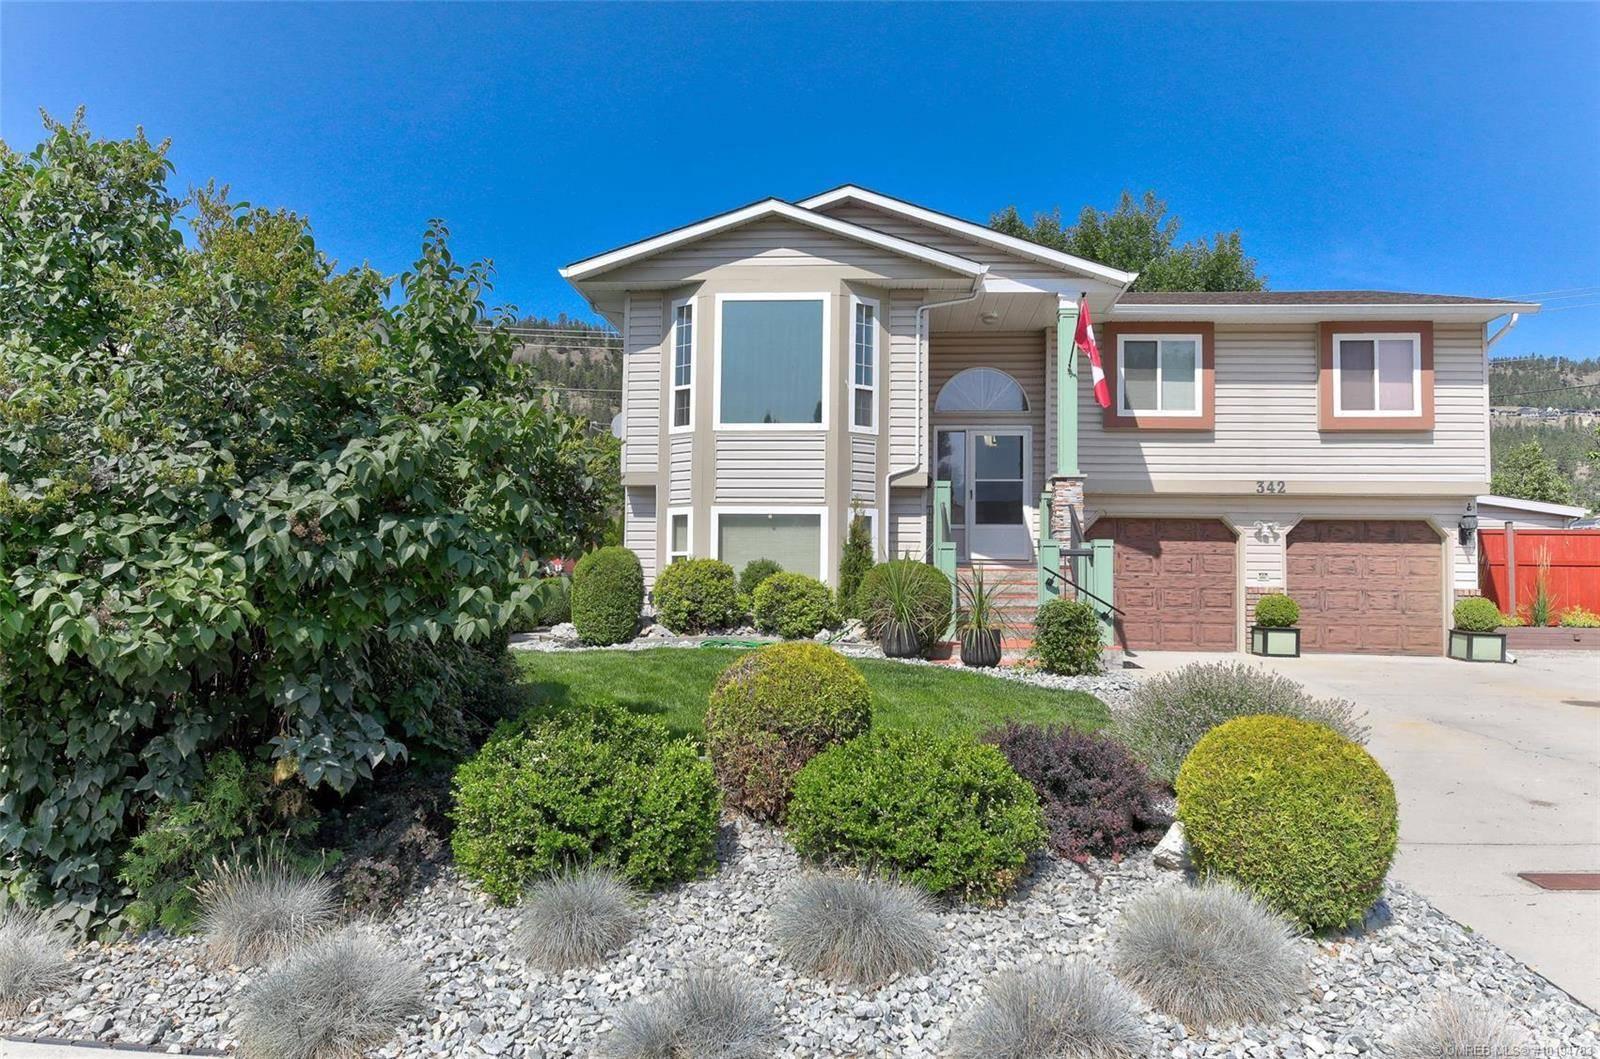 House for sale at 342 Whitman Rd Kelowna British Columbia - MLS: 10194783